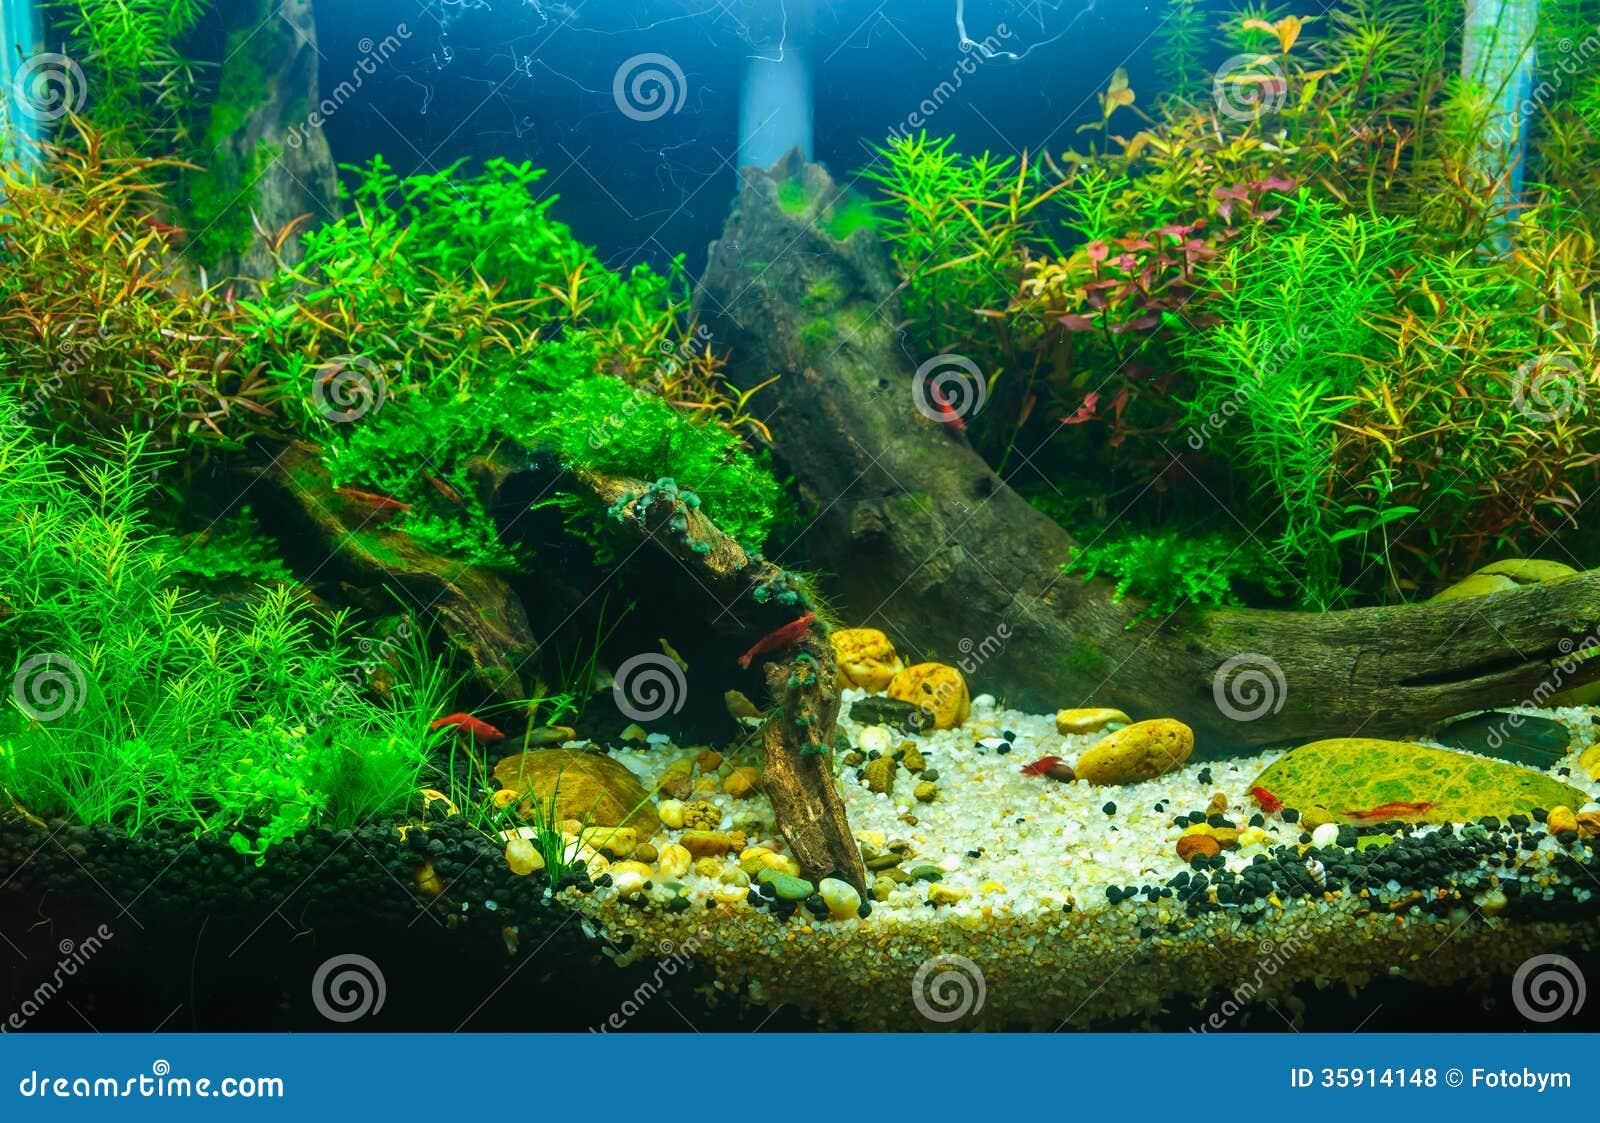 Aquascaping Of The Planted Aquarium Royalty Free Stock Photos Image 35914148